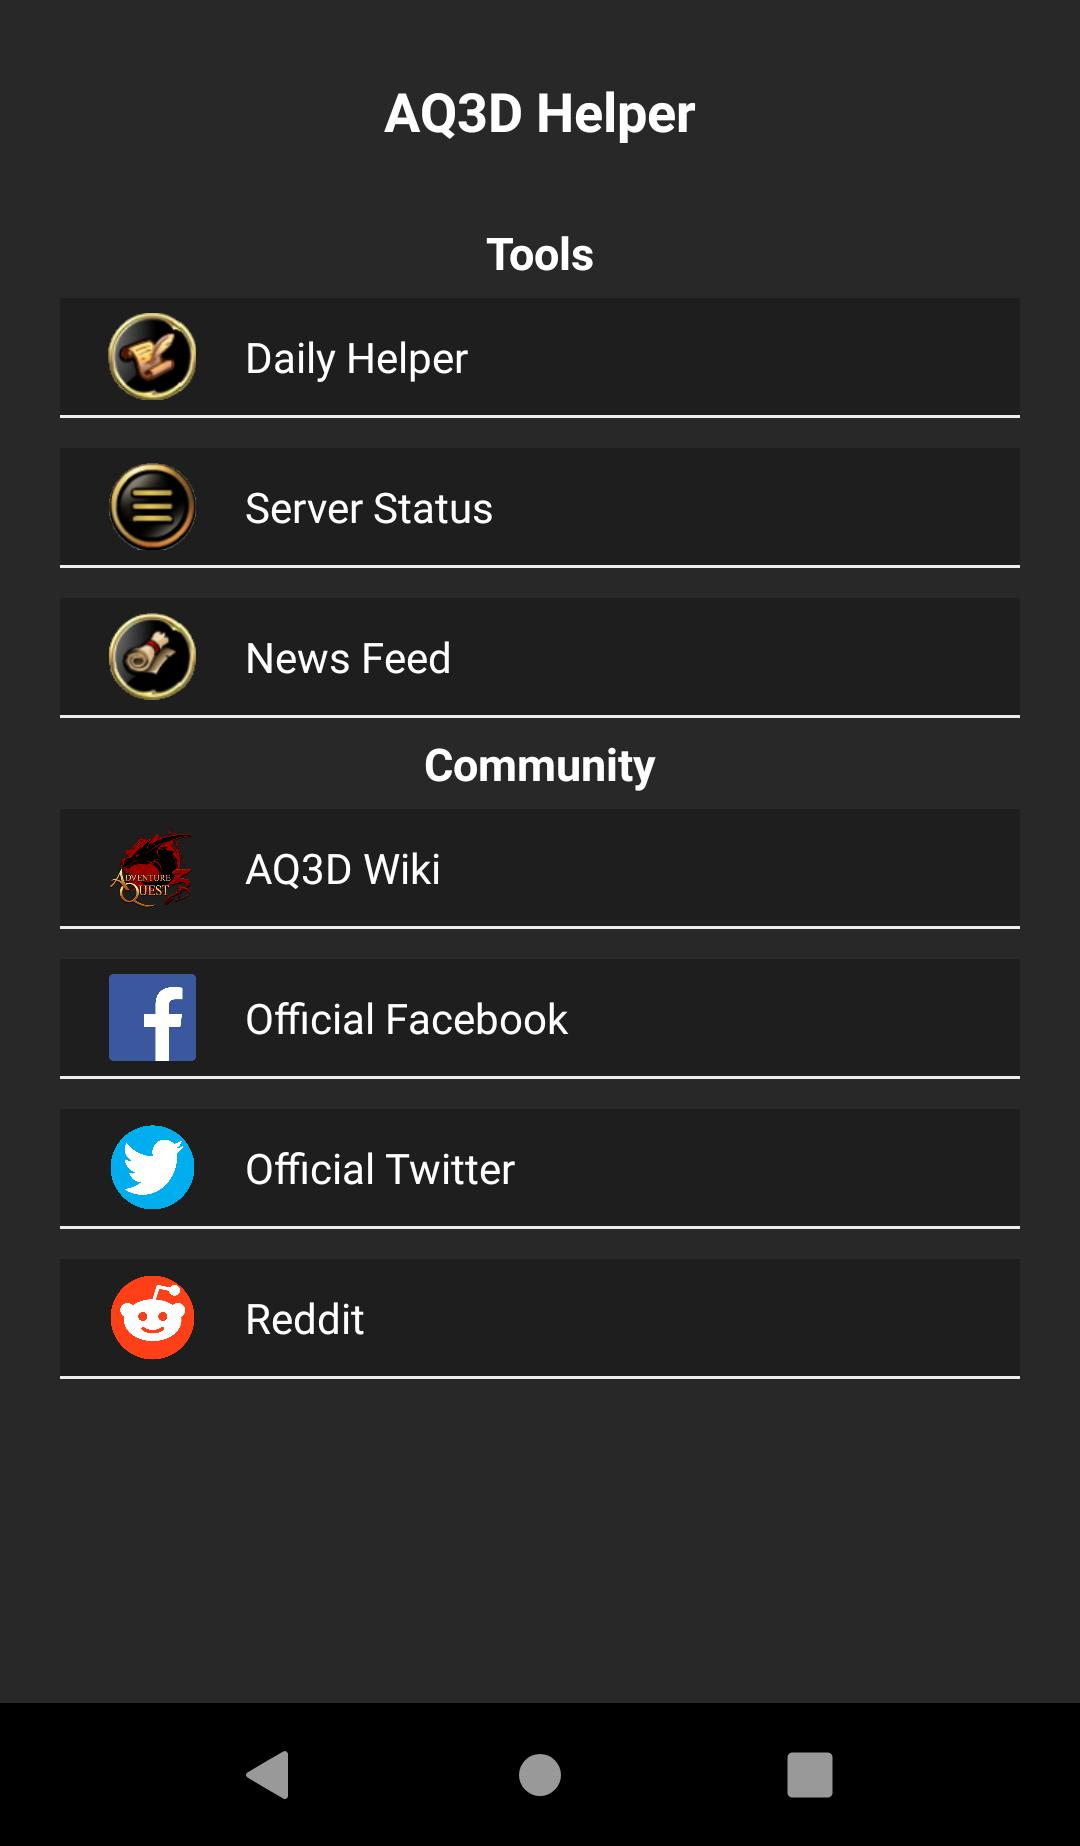 AQ3D Helper for Android - APK Download